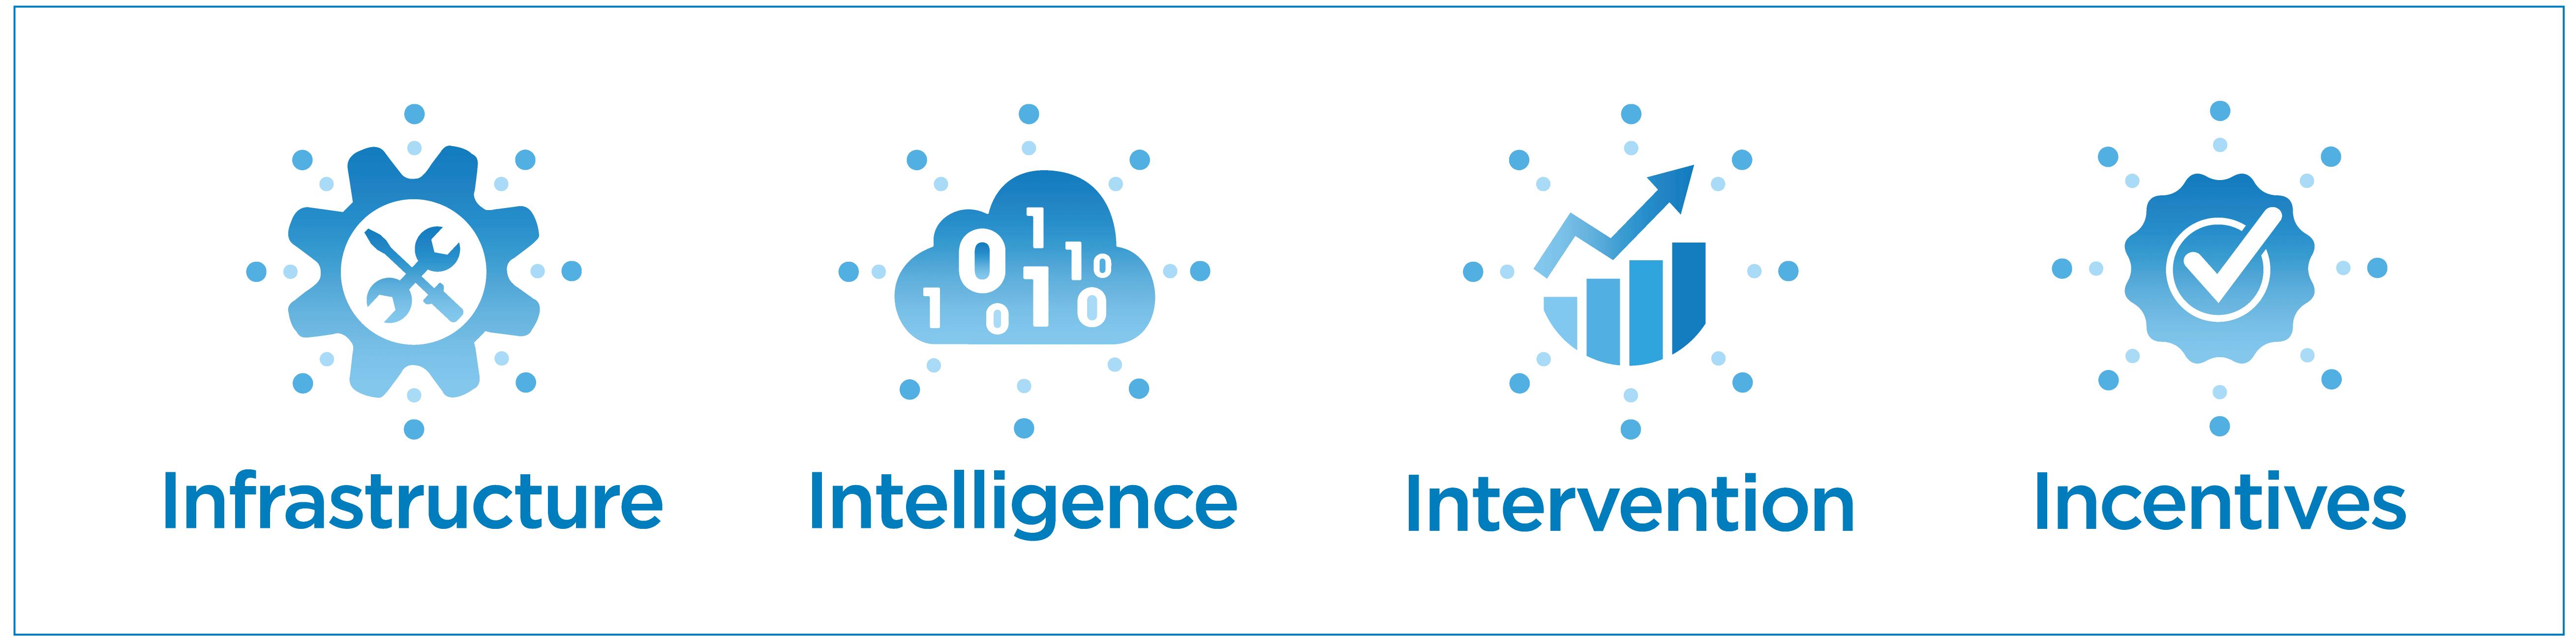 Cerner infrastructure intelligence intervention incentives graphic